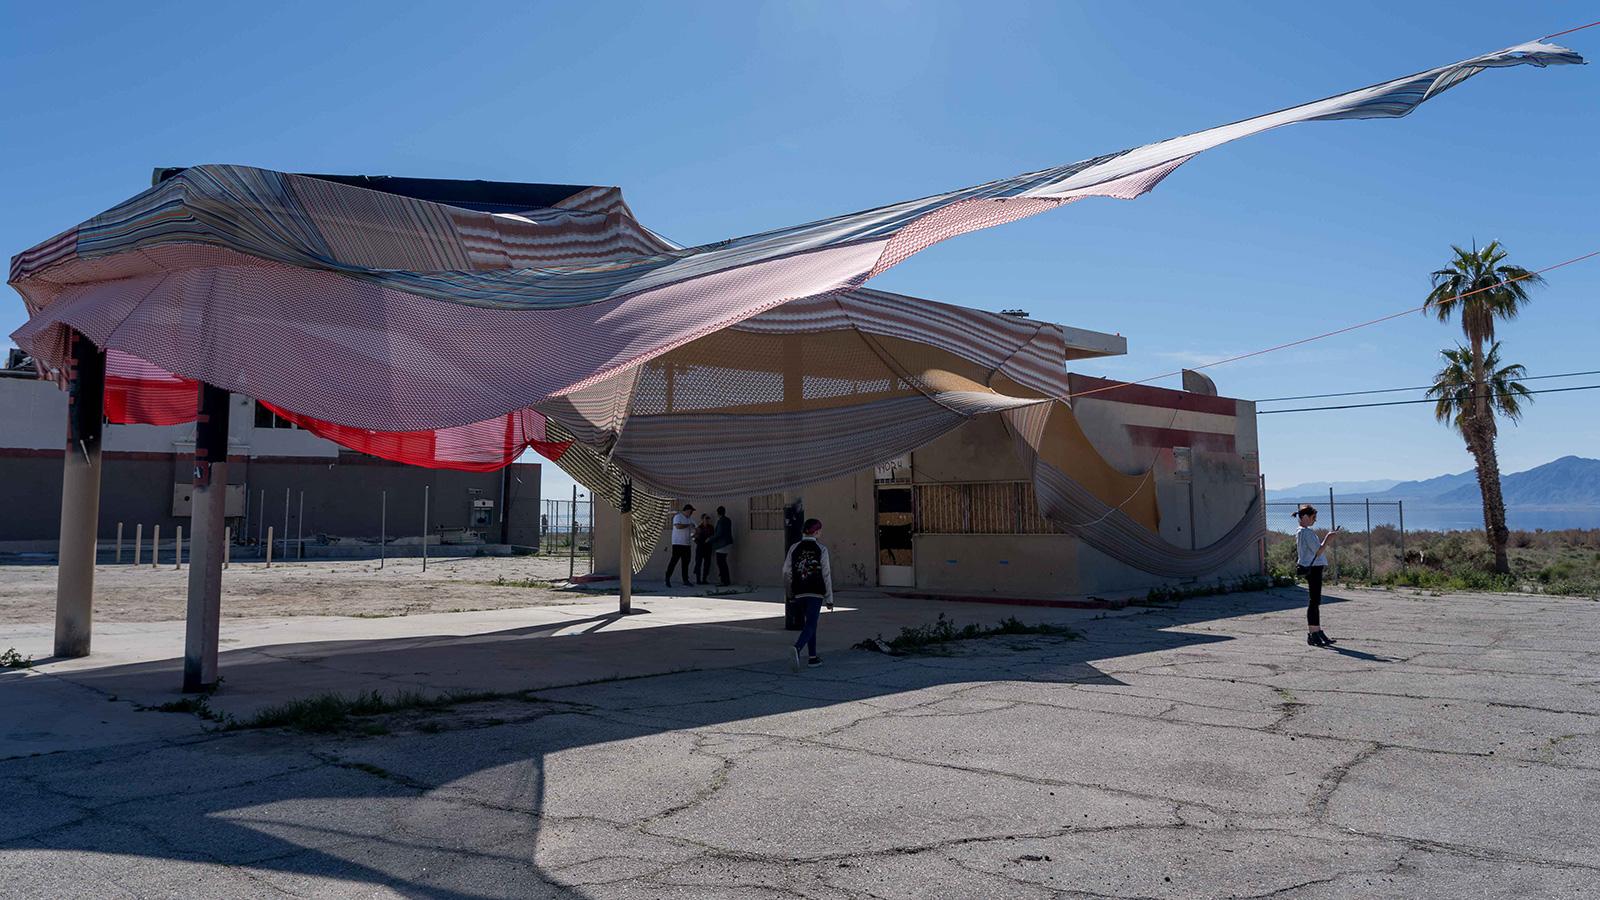 Eric N Mack Halter installation at Desert X 2019